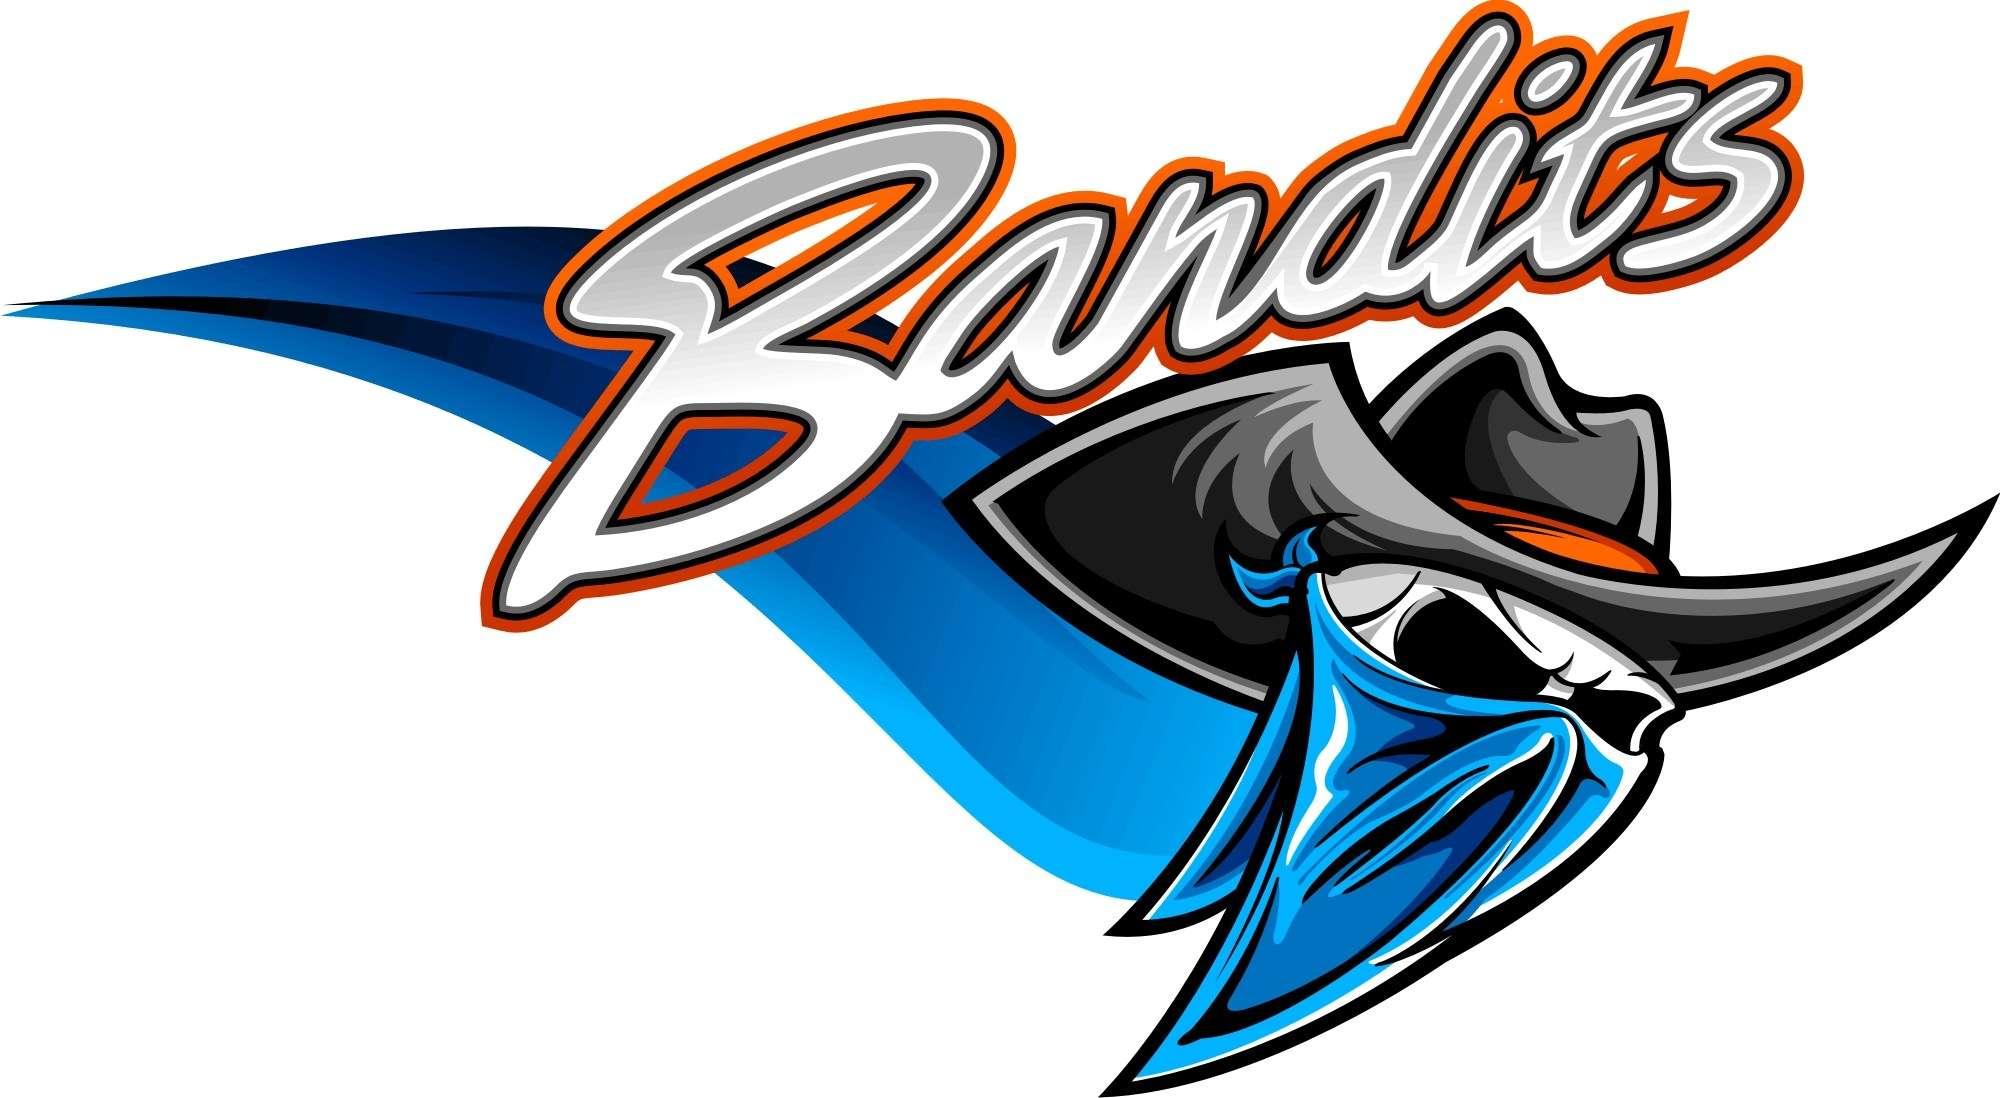 Bandits Fastpitch 98